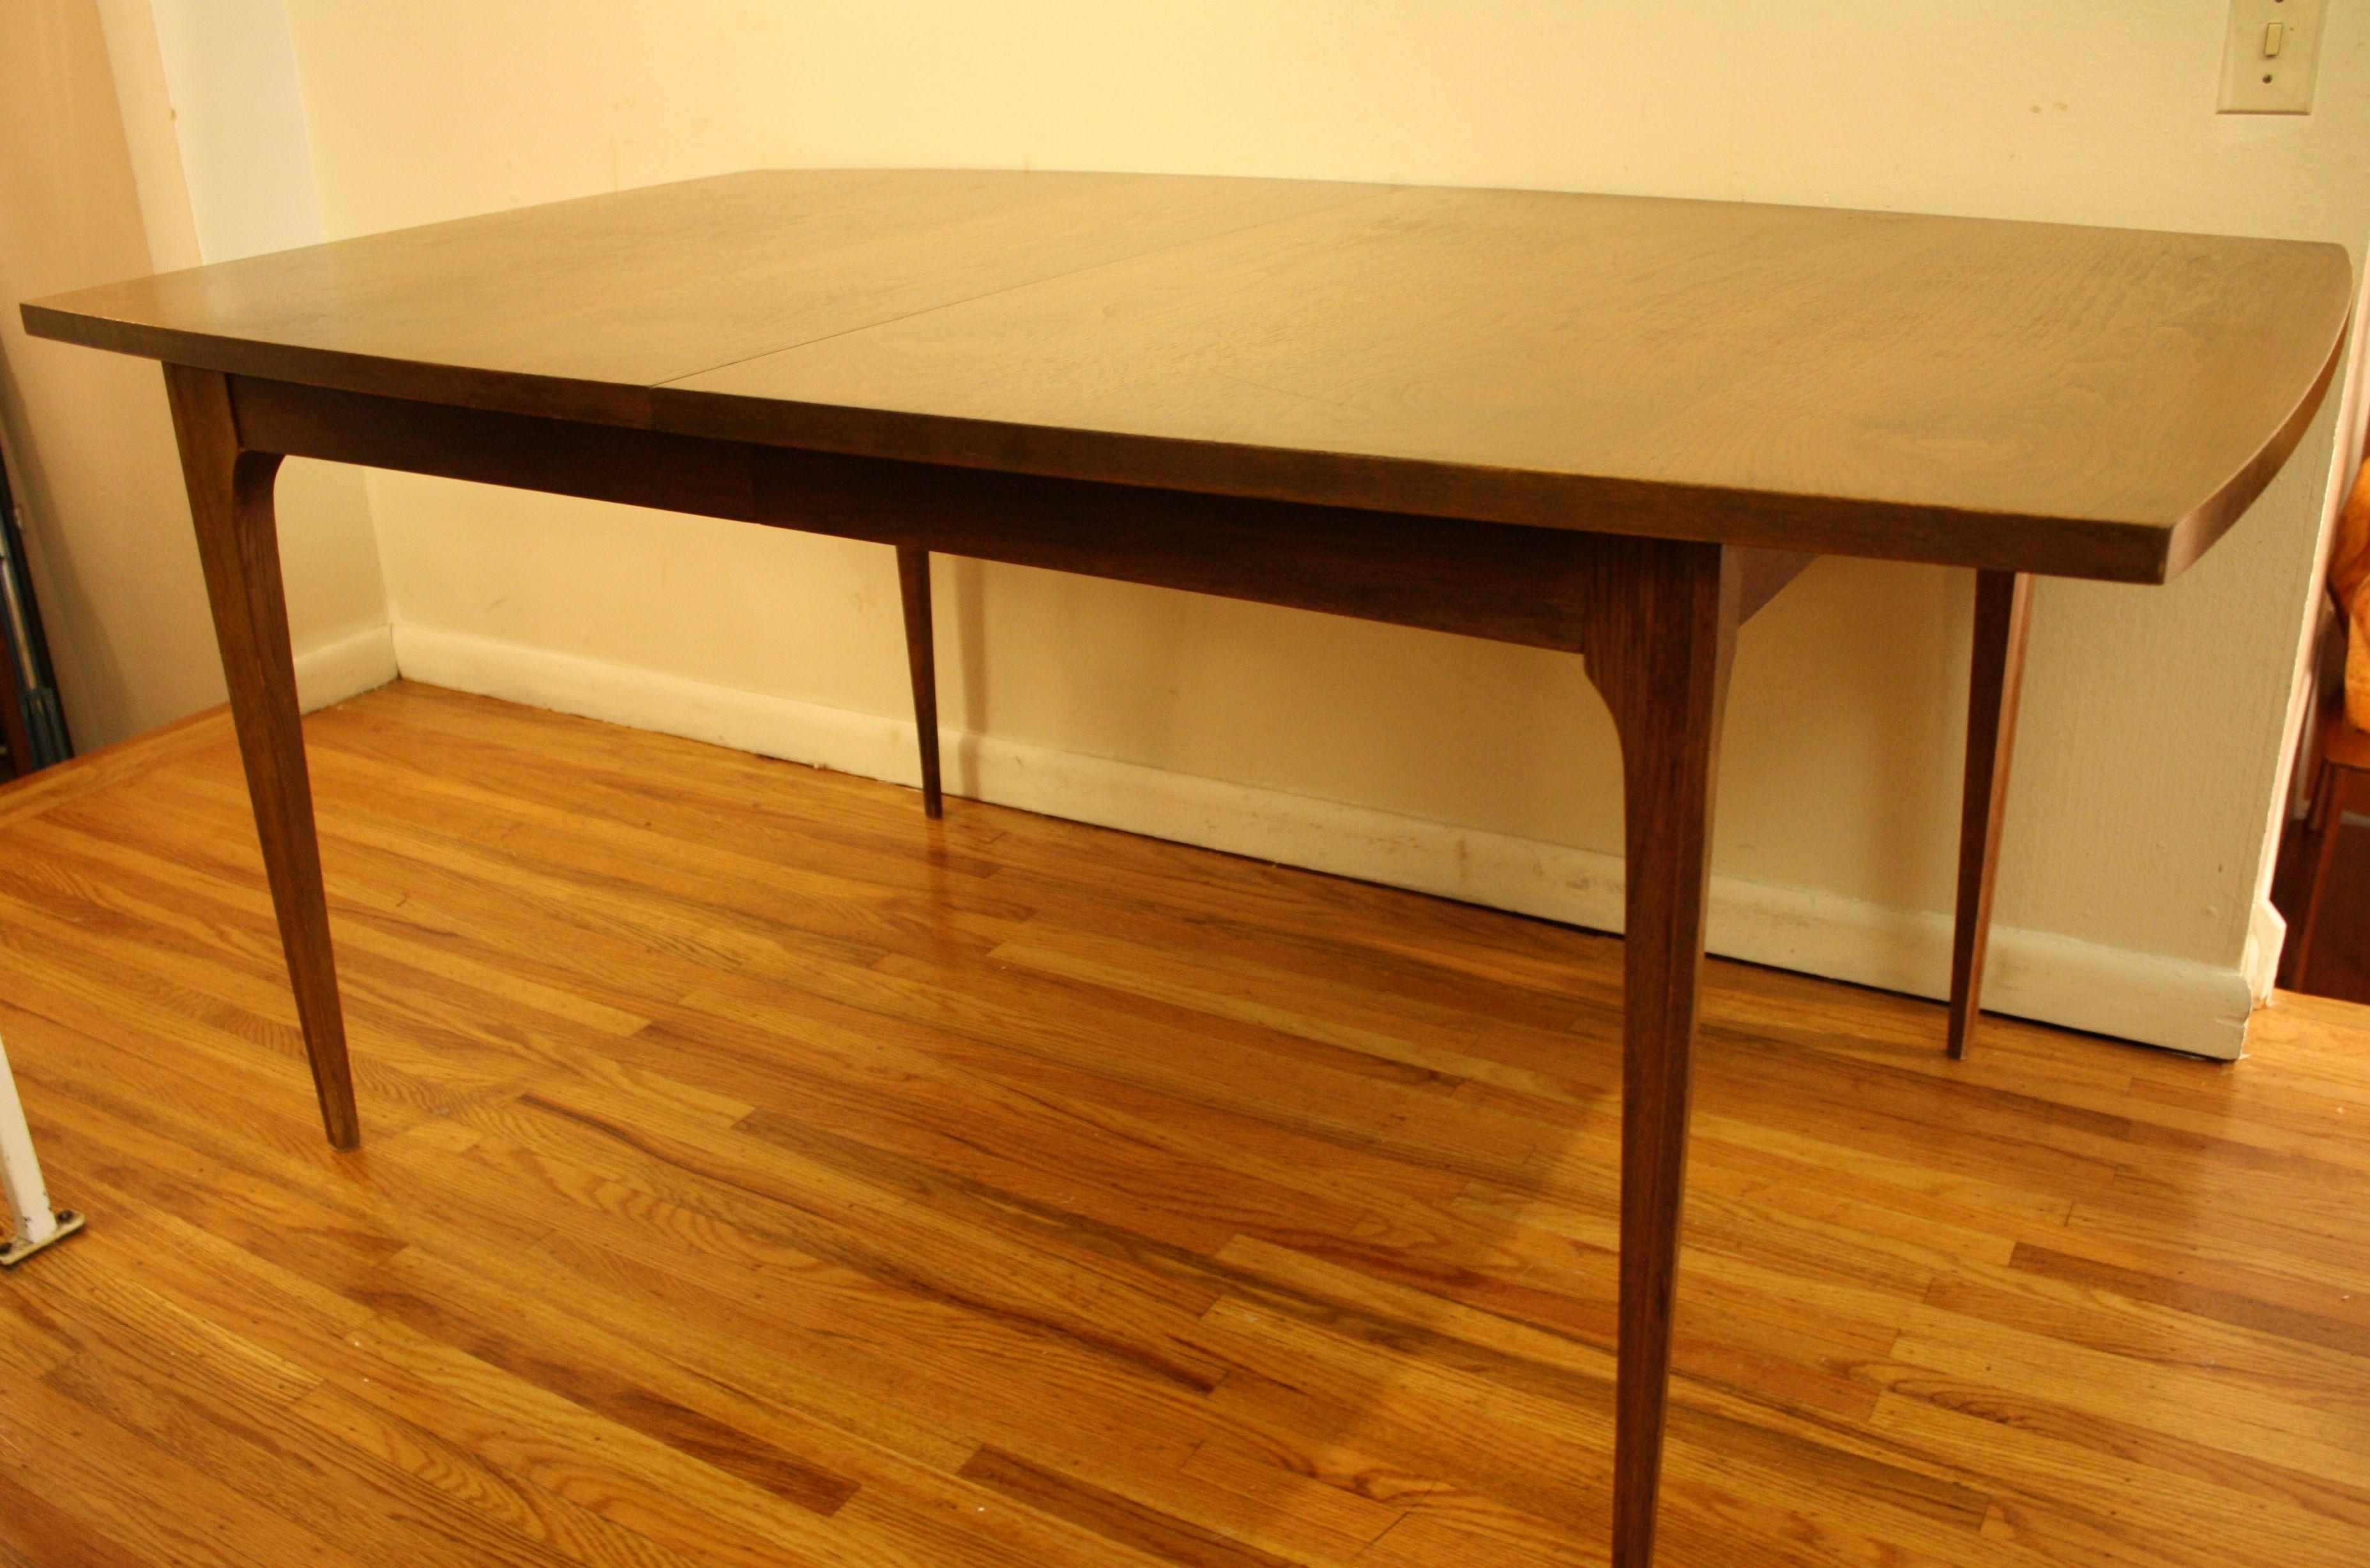 Broyhill brasilia dining table 1 furniture broyhill brasilia broyhill brasilia dining table 1 dzzzfo